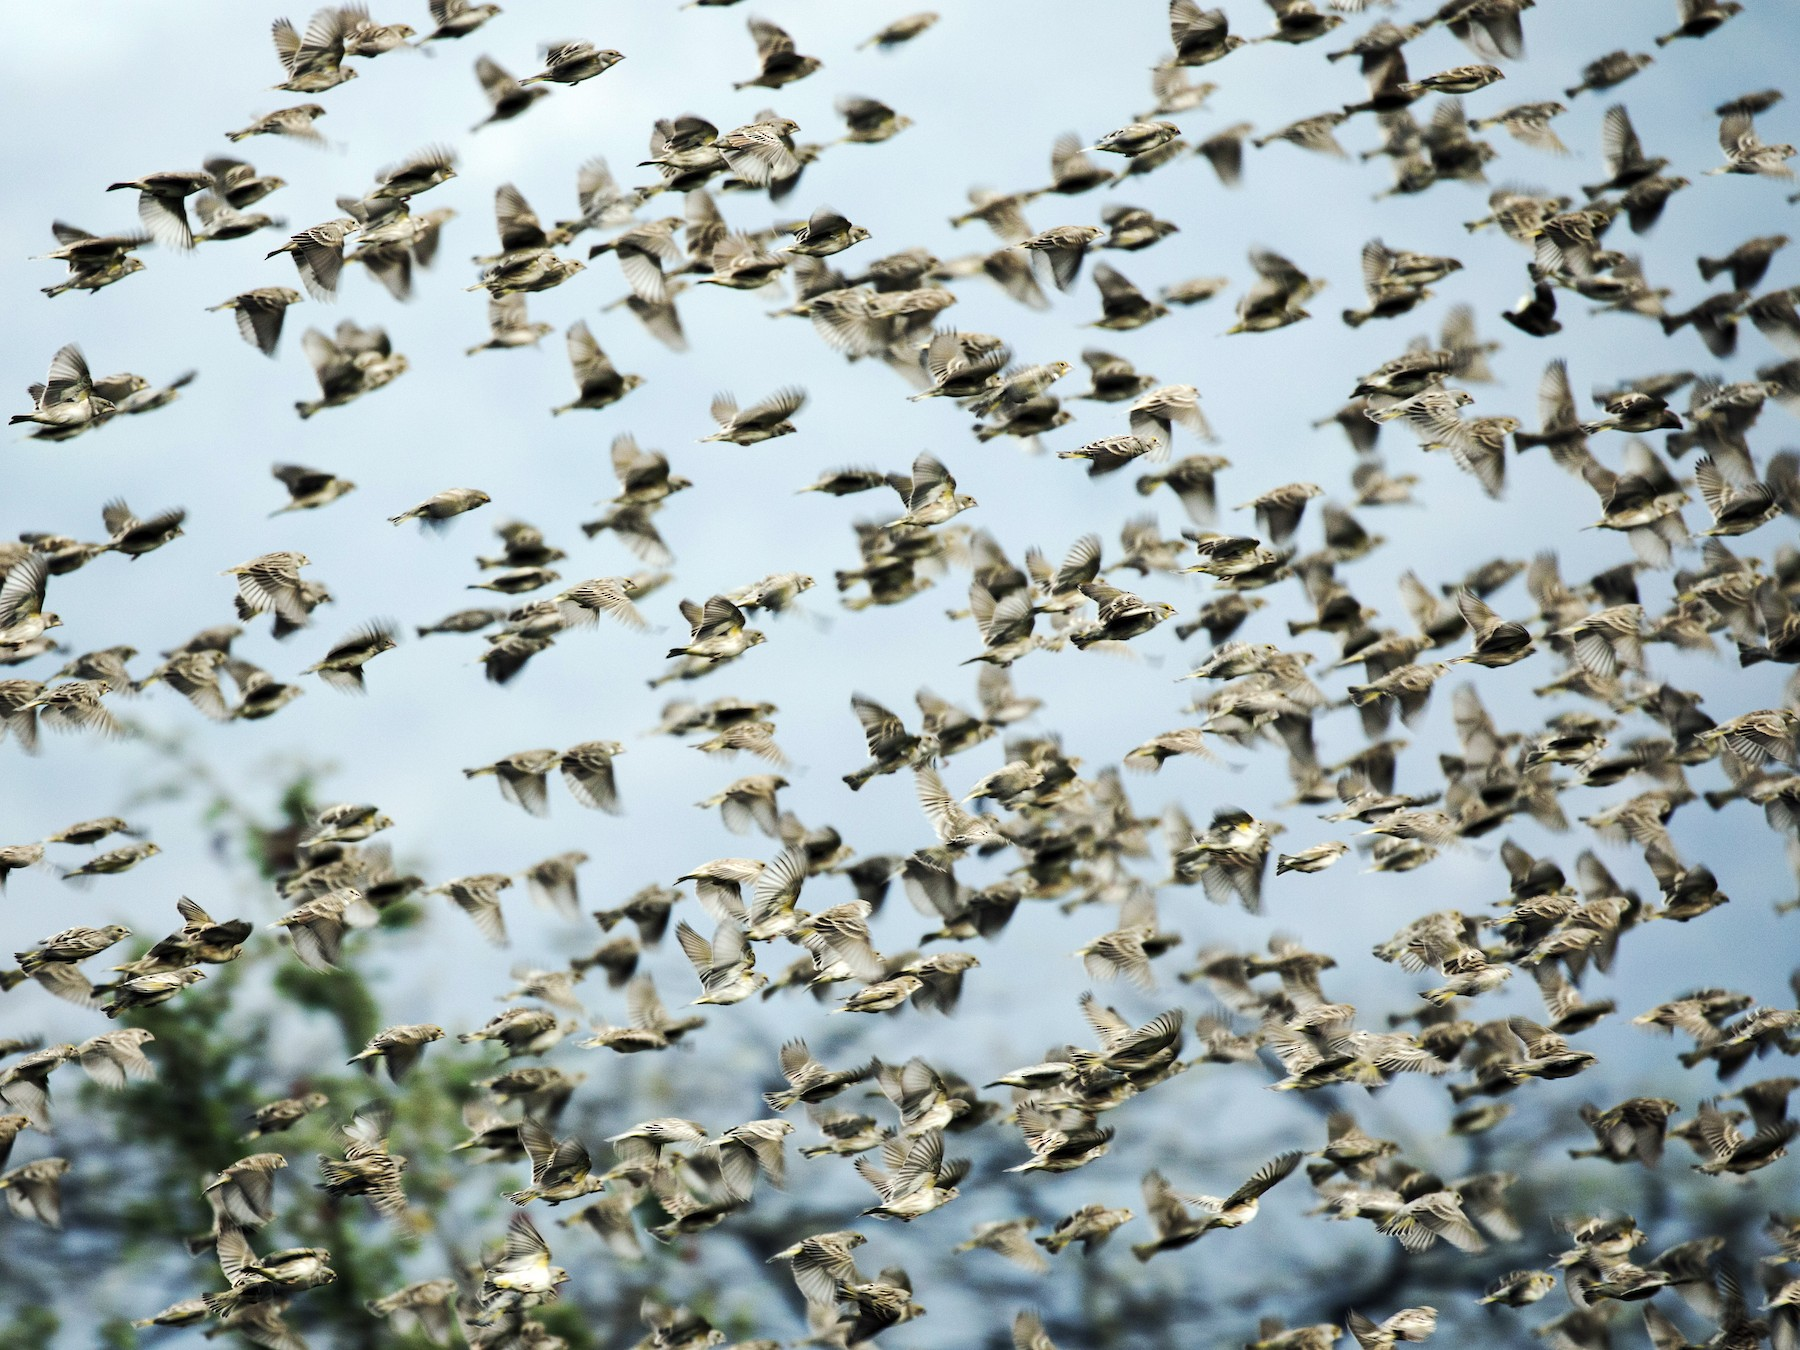 Sulphur-throated Finch - Nick Athanas